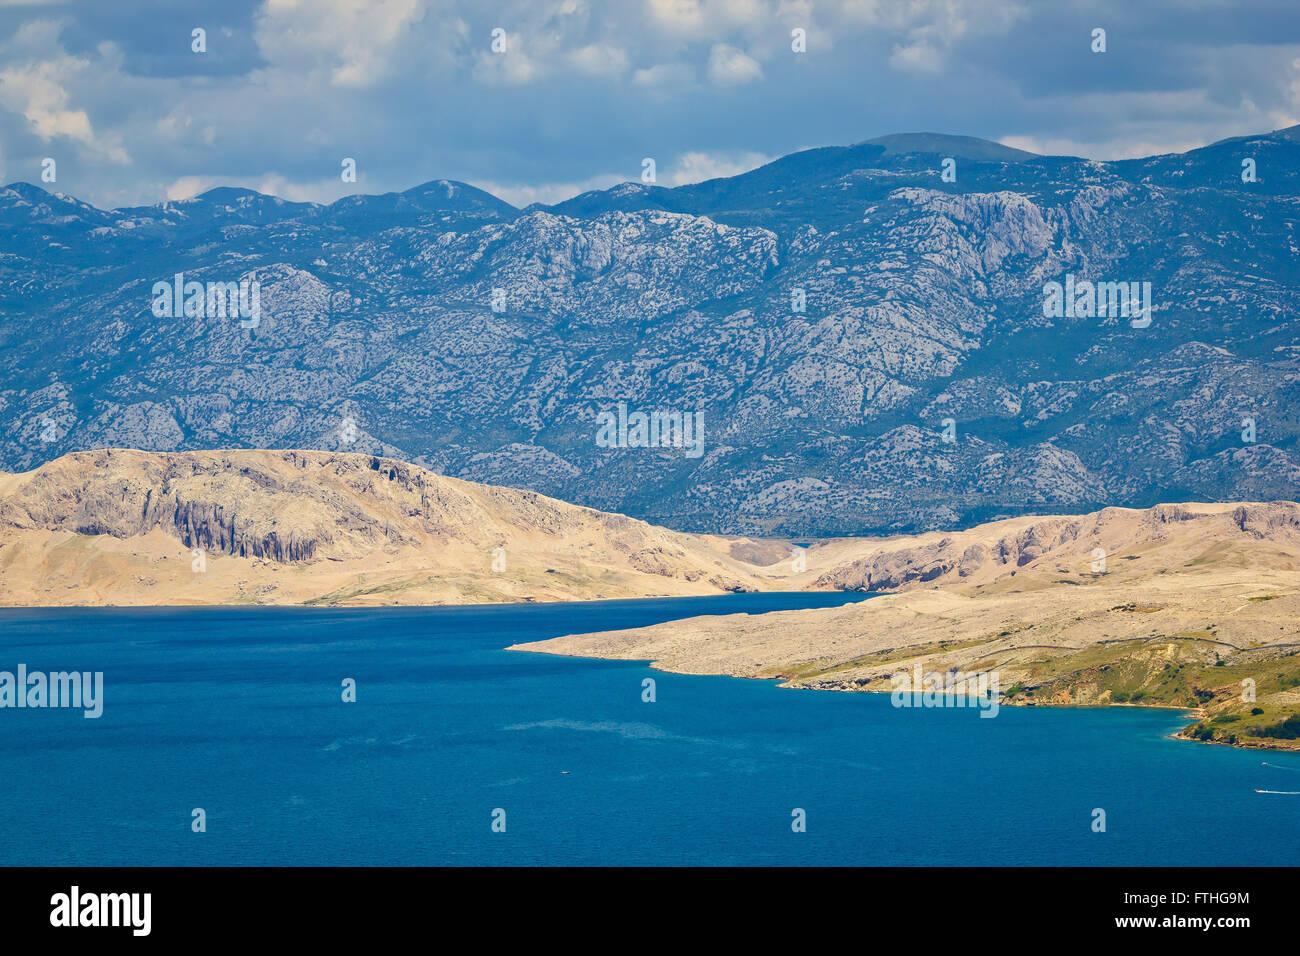 Island of Pag and Velebit mountain, Croatia - Stock Image